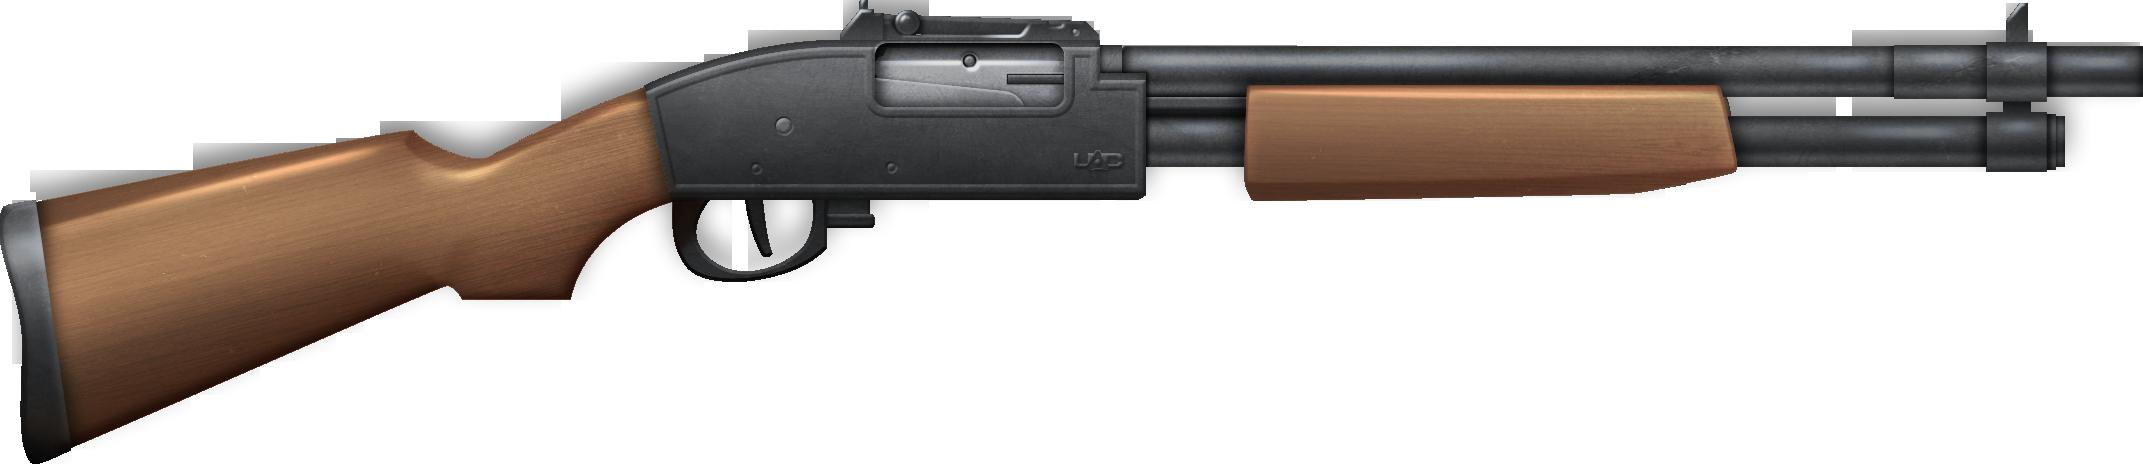 Big Guns PNG - 158437